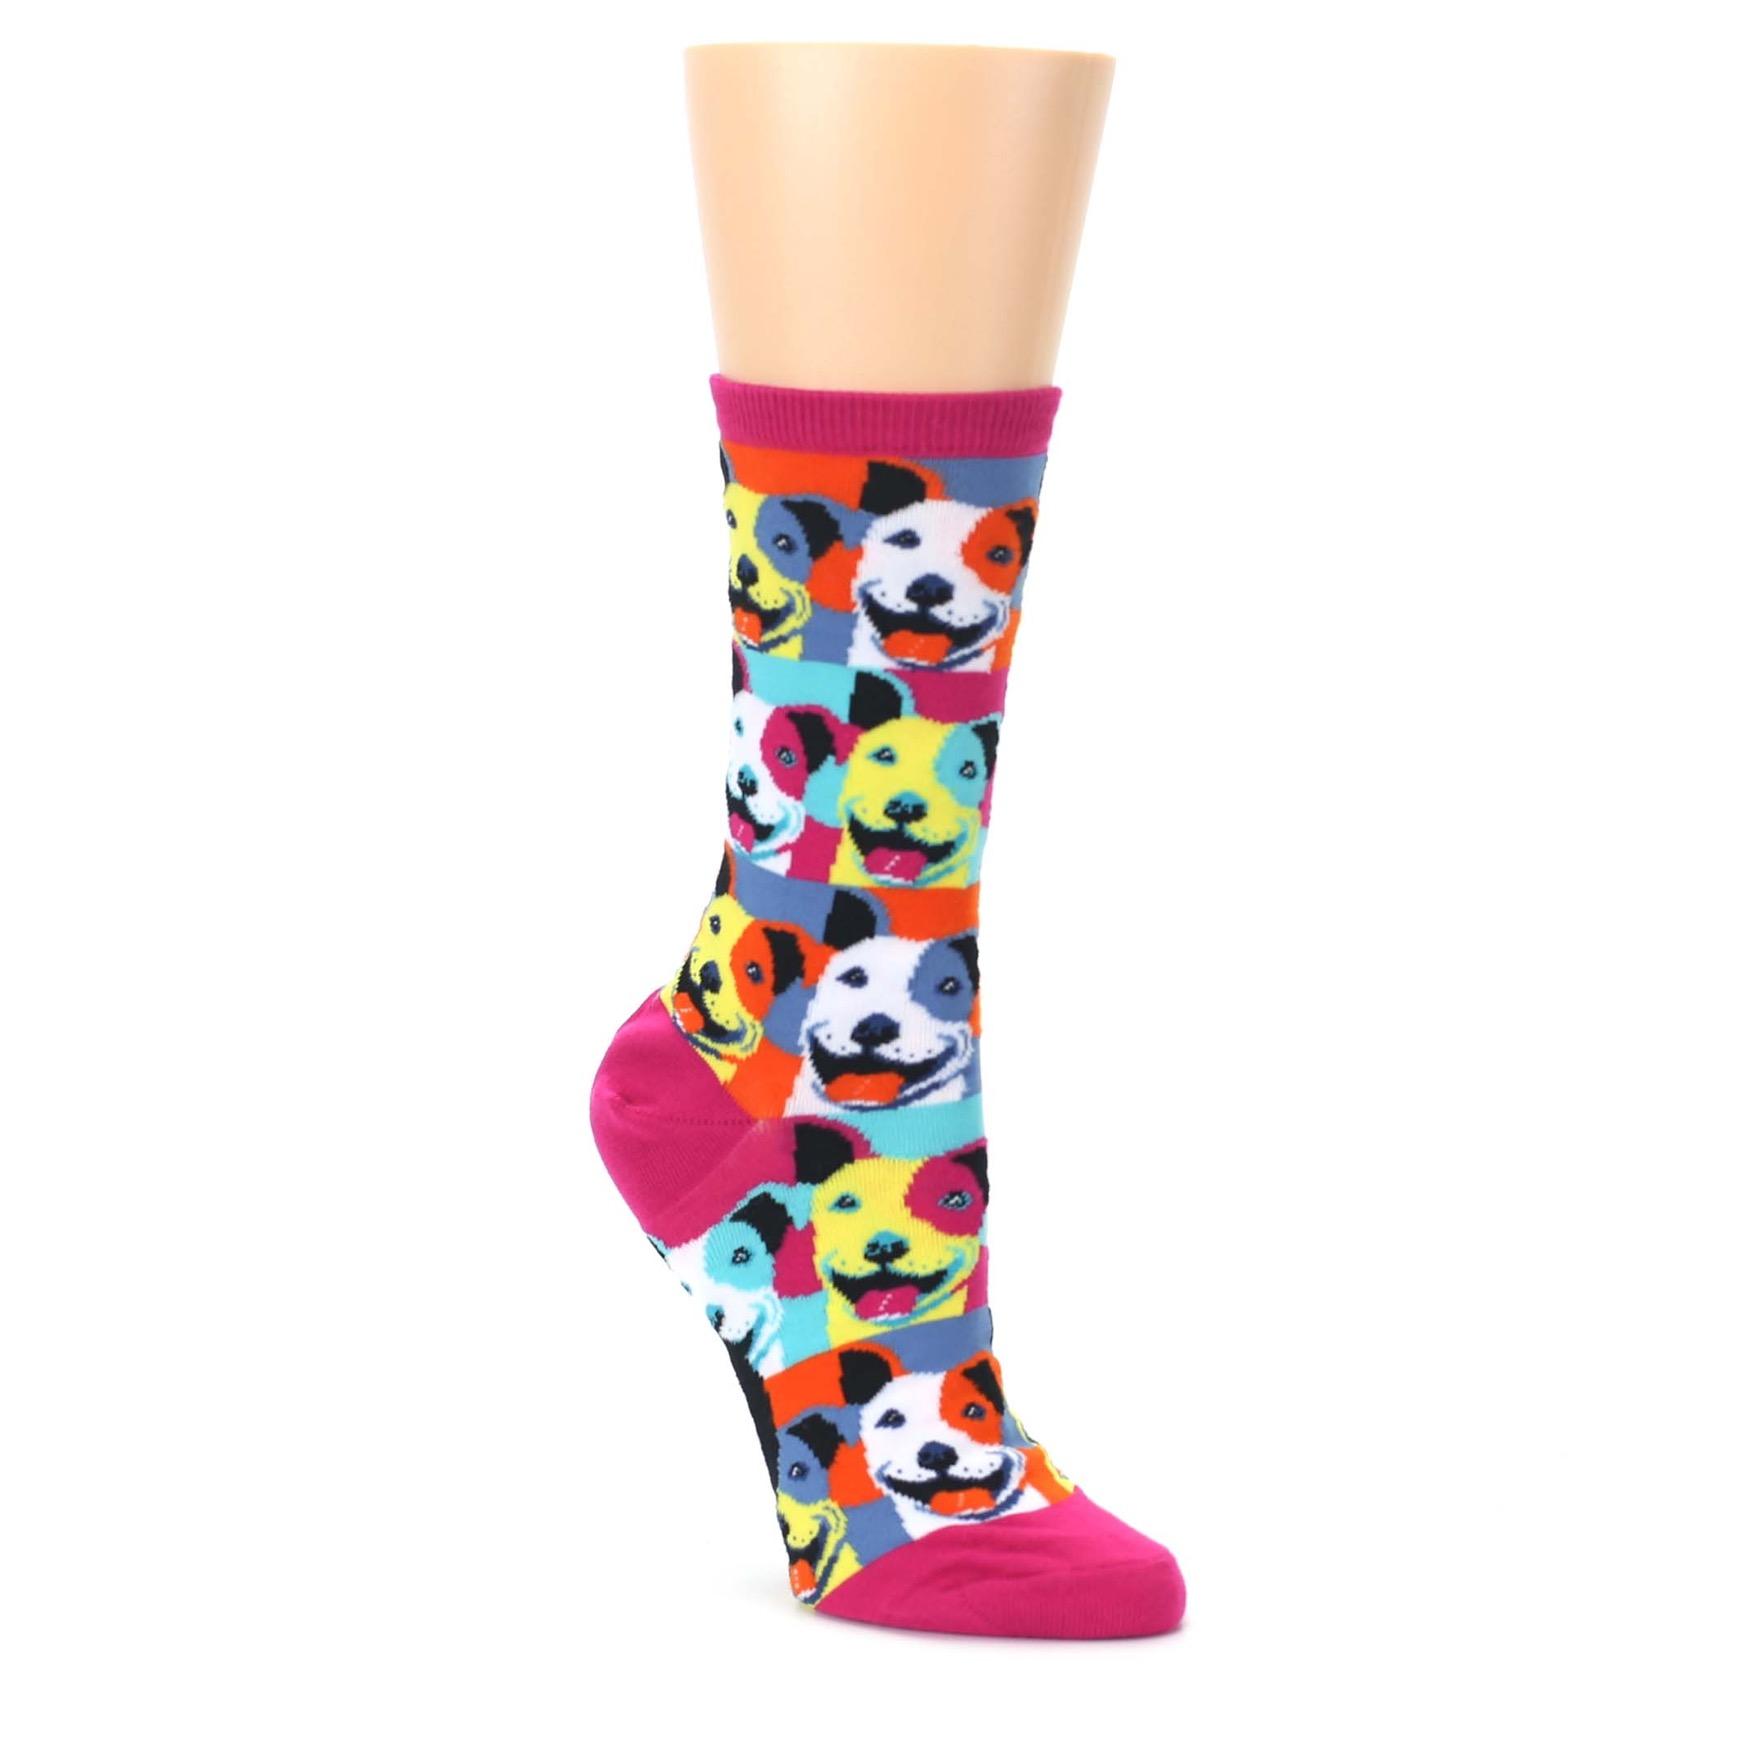 Magenta Multi Color Pitbull Pop Art Women's Dress Socks | boldSOCKS